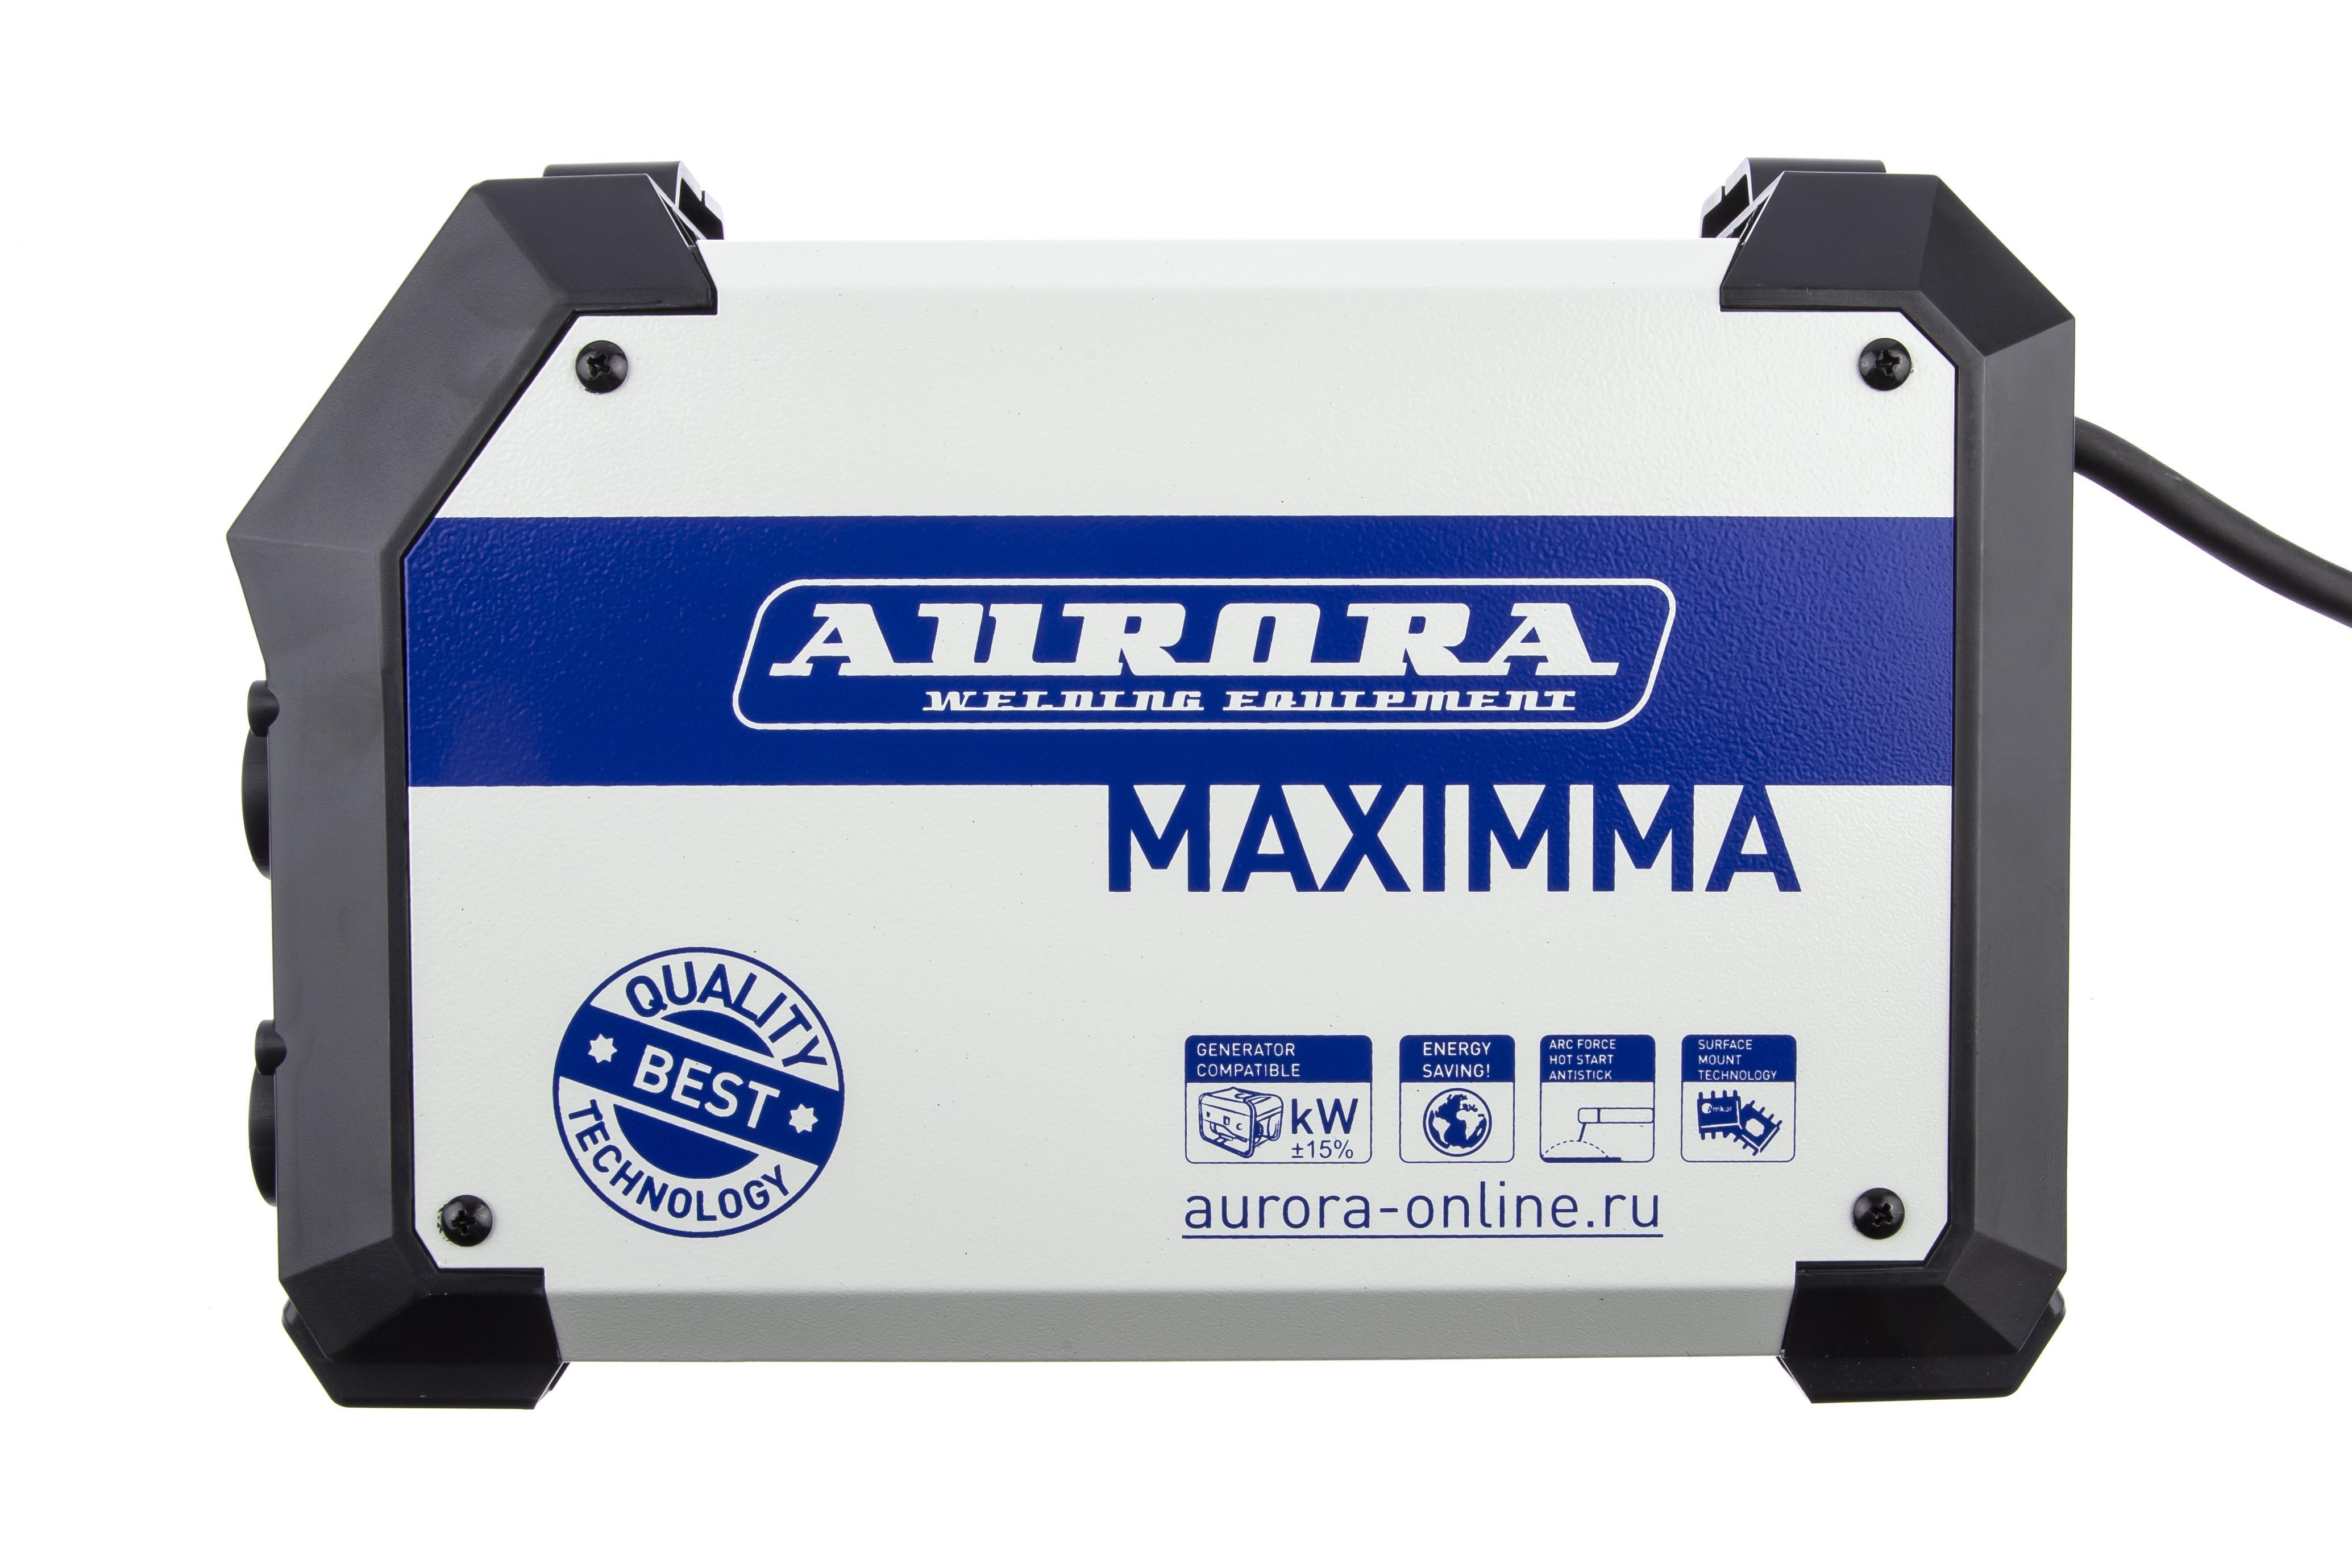 Инвертор Aurora Maximma 2000